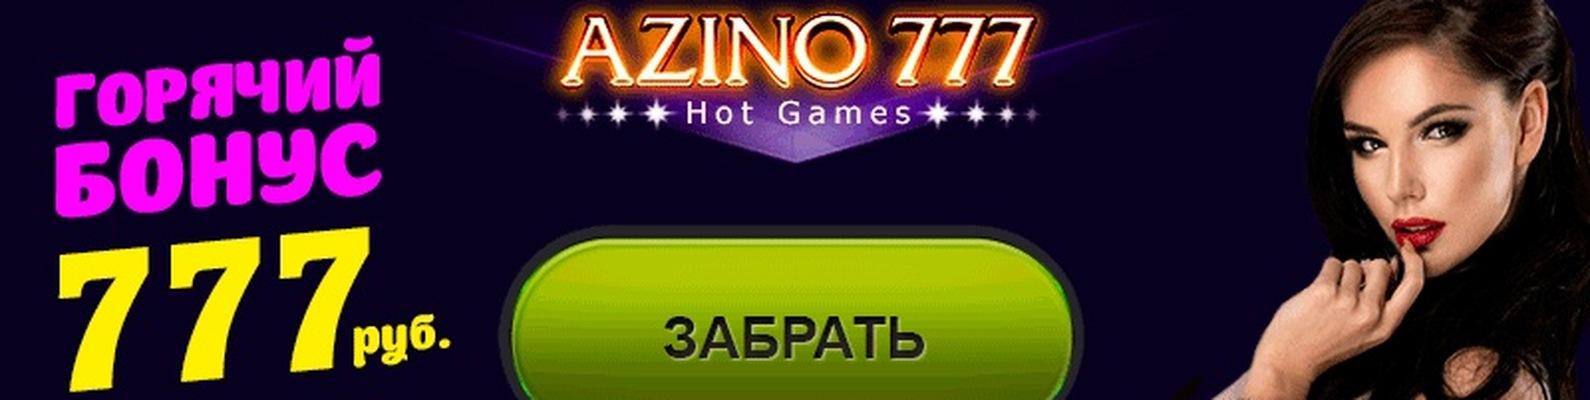 31082018 azino777